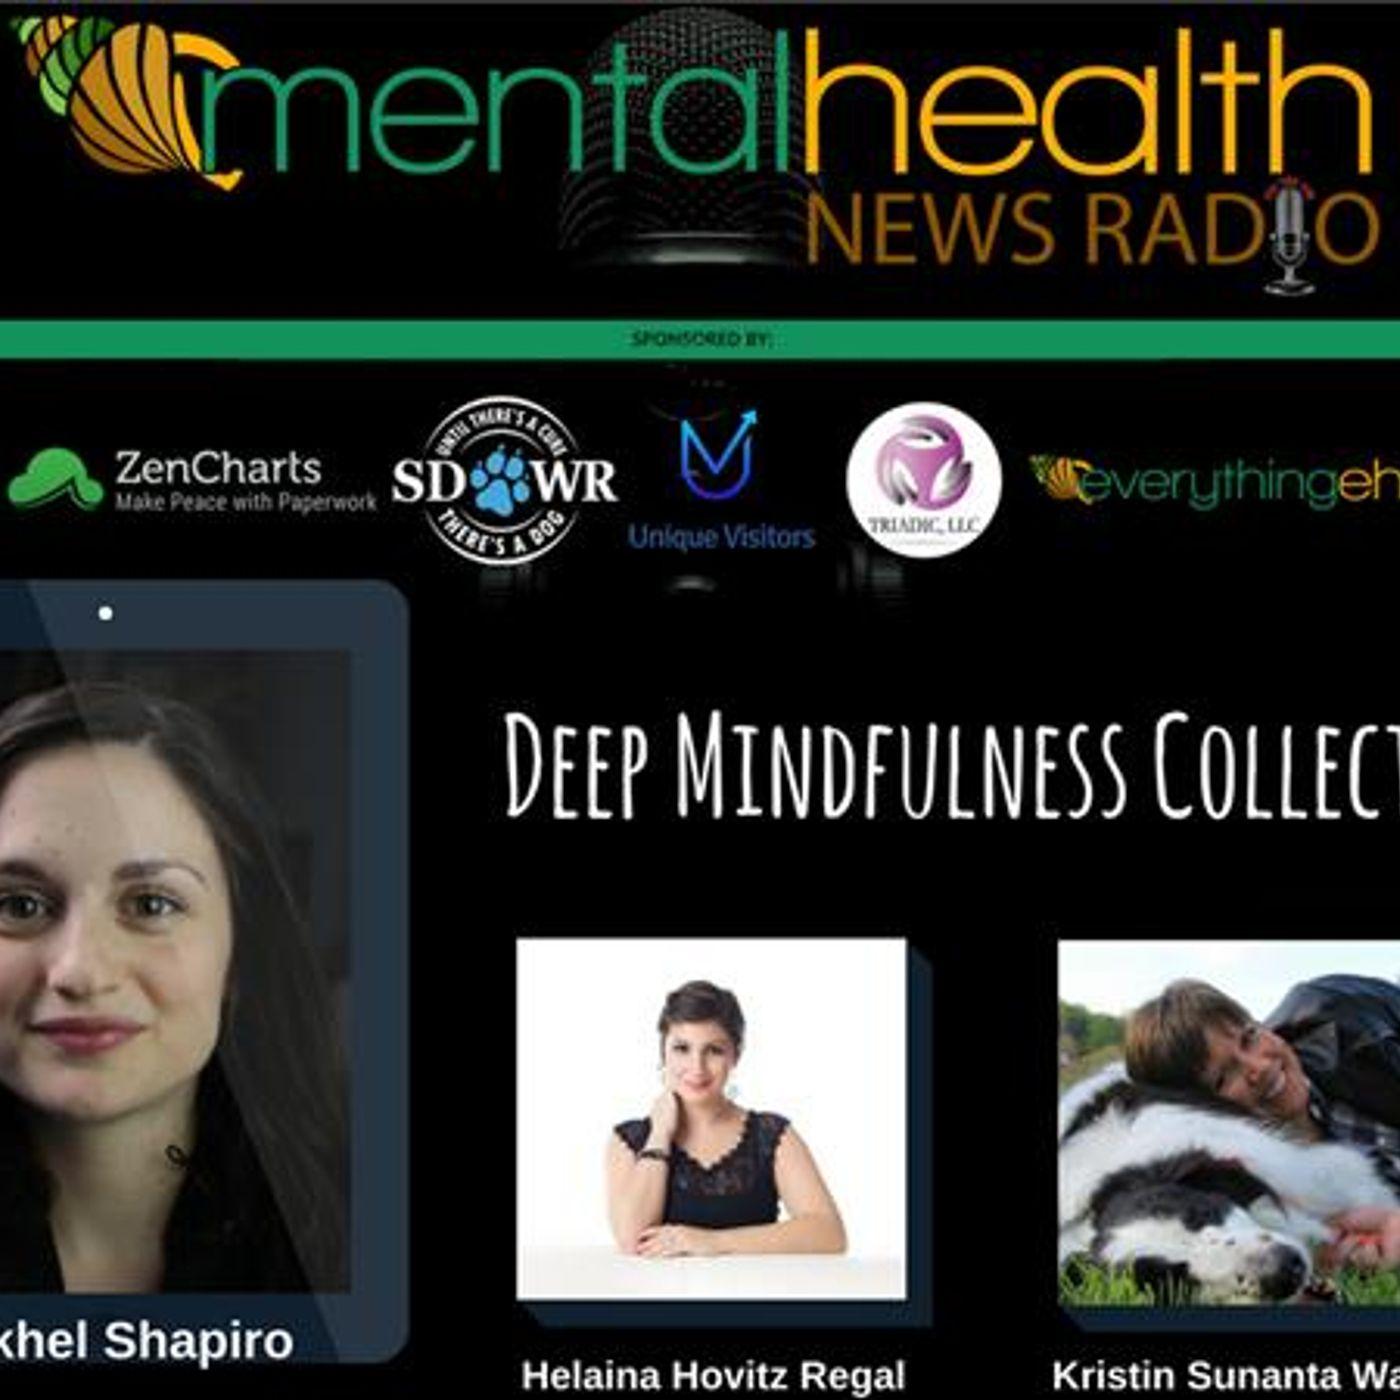 Mental Health News Radio - Deep Mindfulness Collective with Rakhel Shapiro